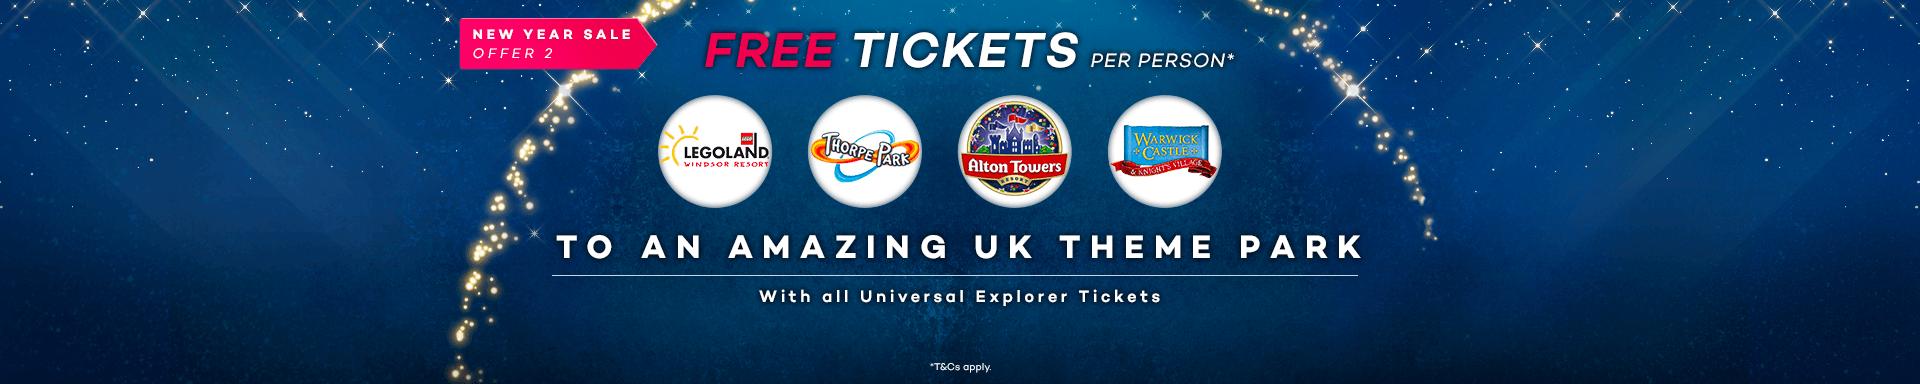 enjoy free uk theme park tickets on us